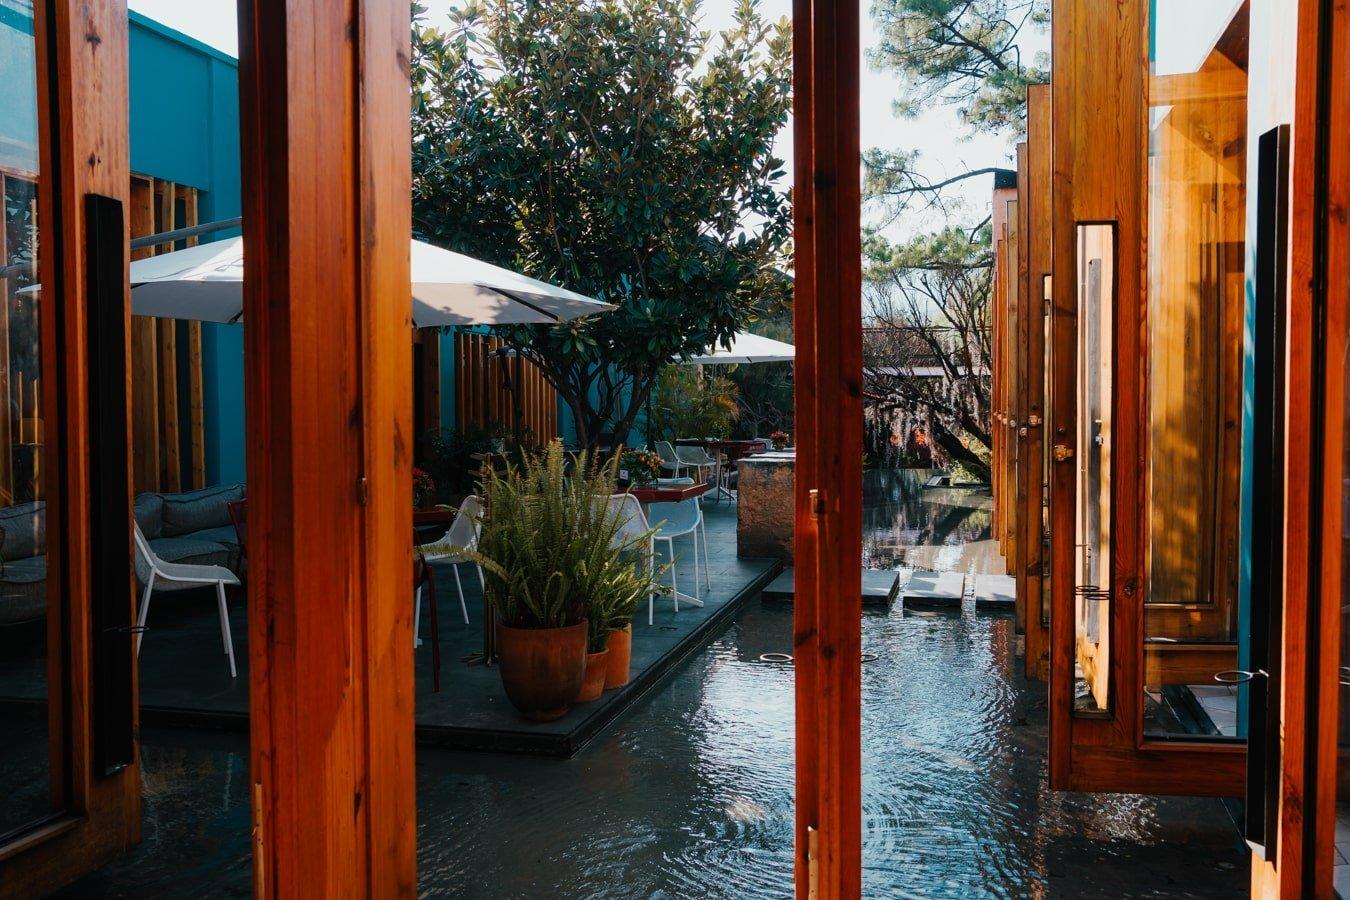 hotel bo san cristobal outdoor terrace